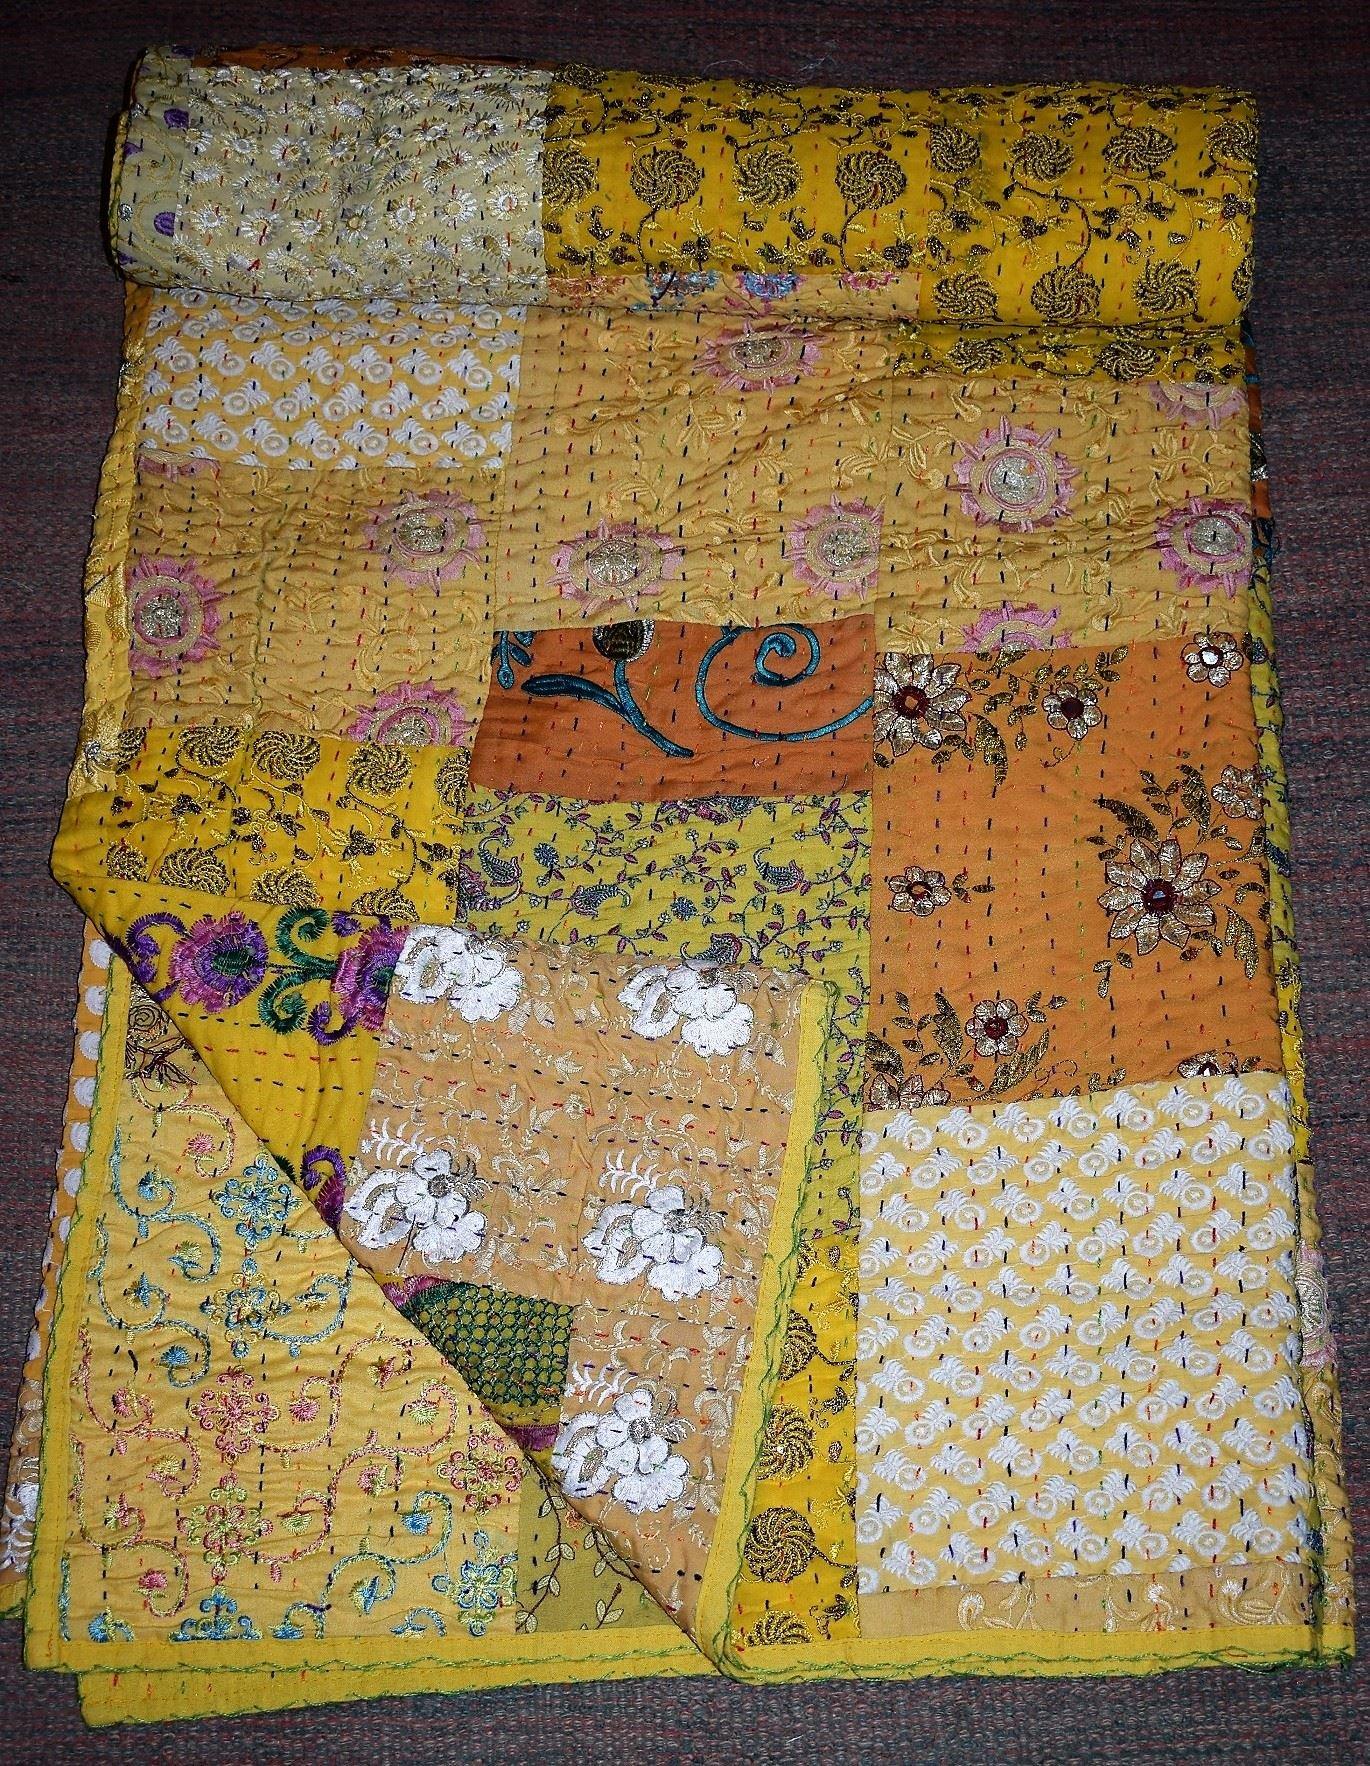 Reversible Twin Kantha Quilt Handmade Vintage Throw Bohemian blanket Indian Bedspread Coverlet Gudri